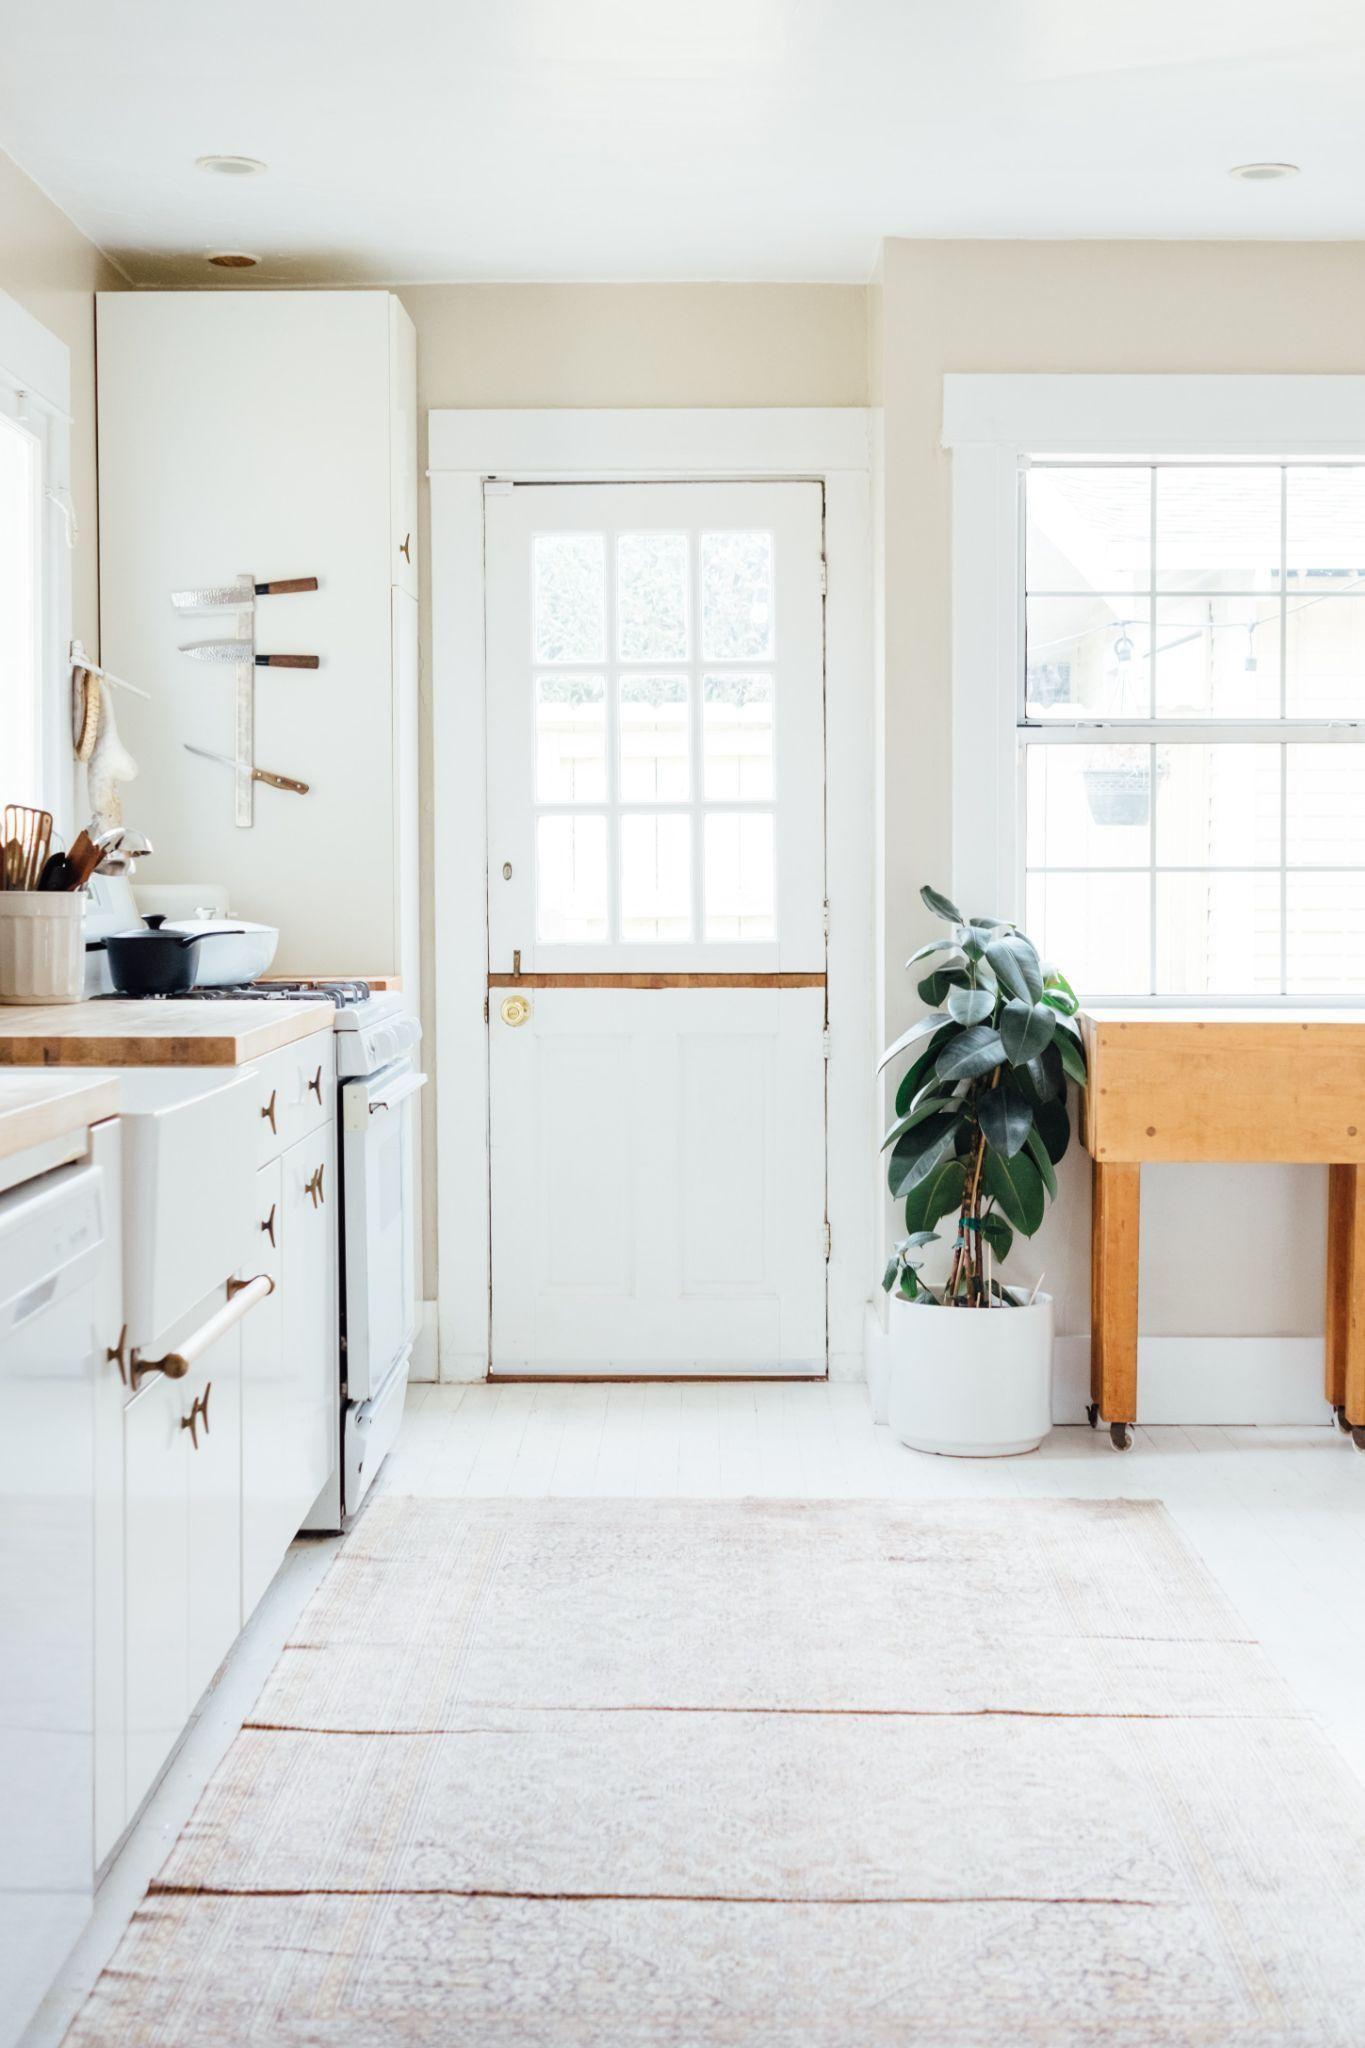 Home Maintenance: How to Install Smoke Detectors